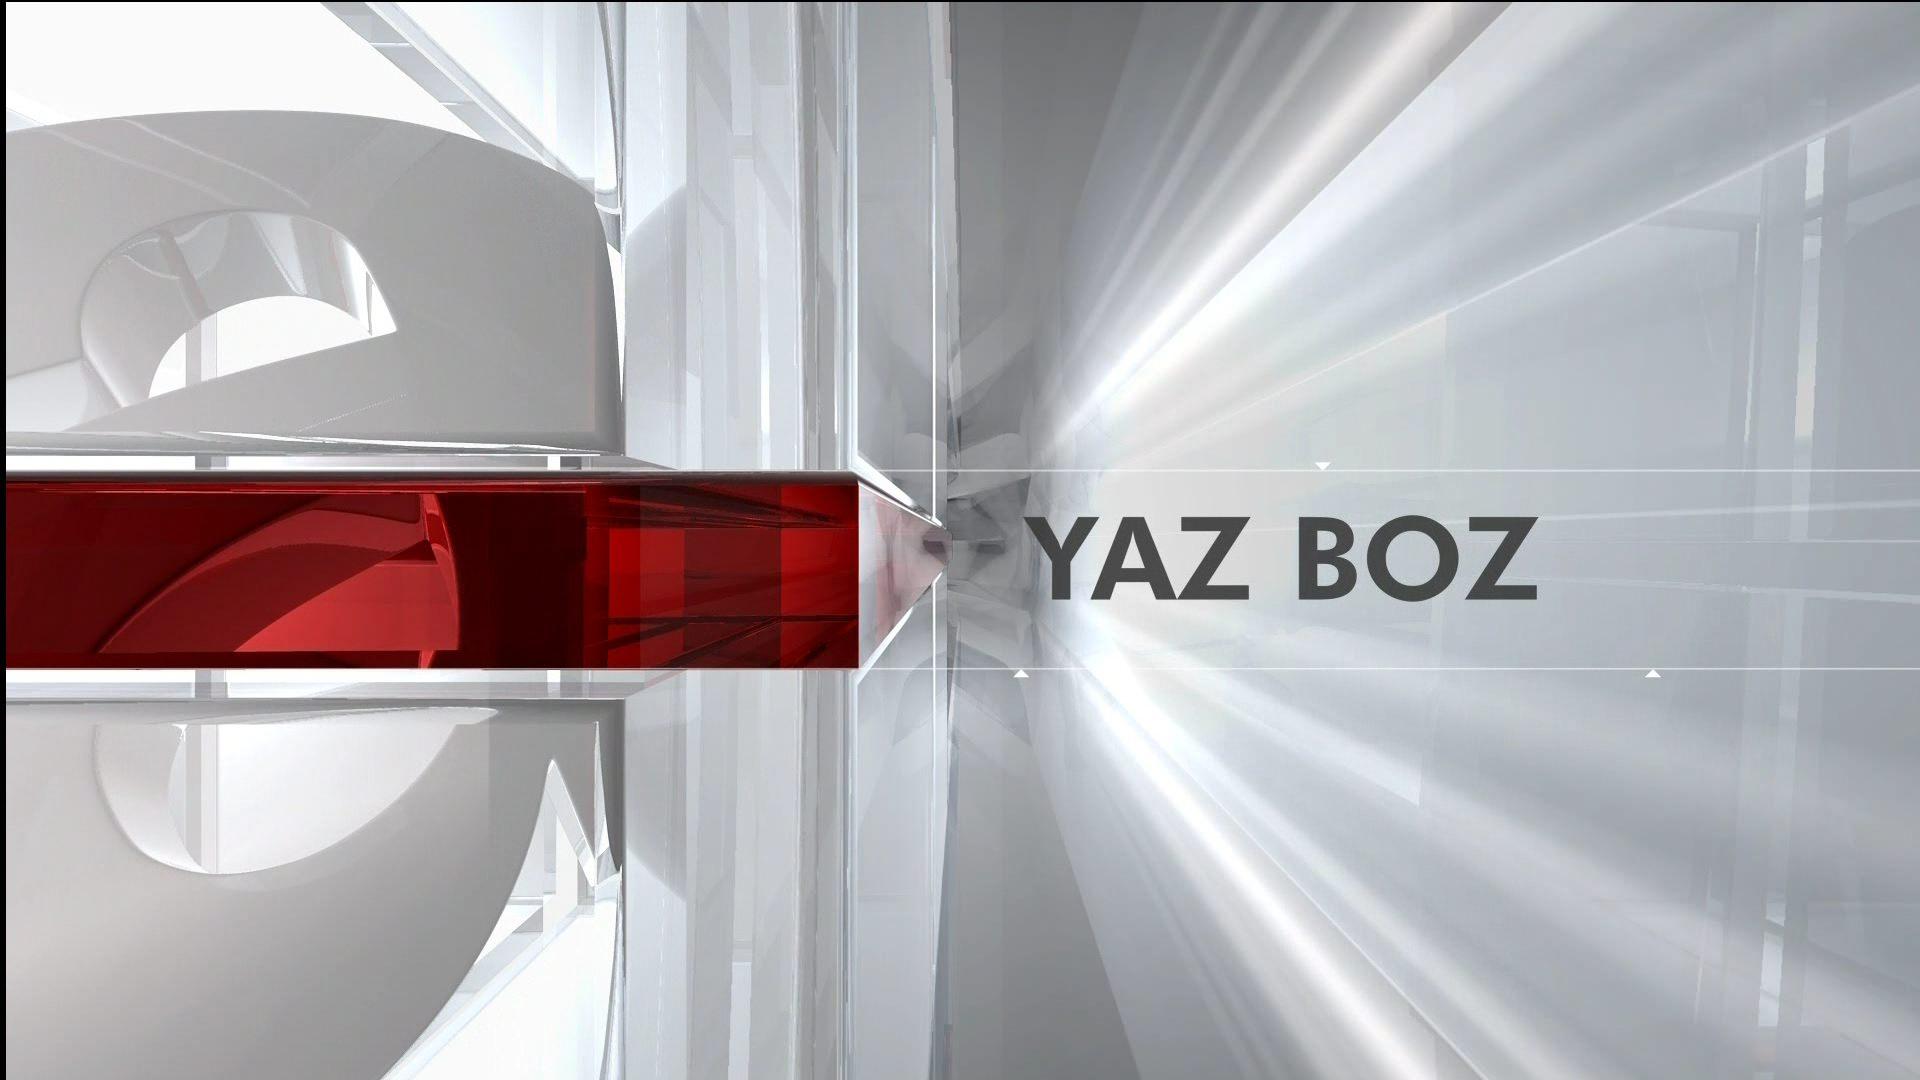 Yaz-Boz